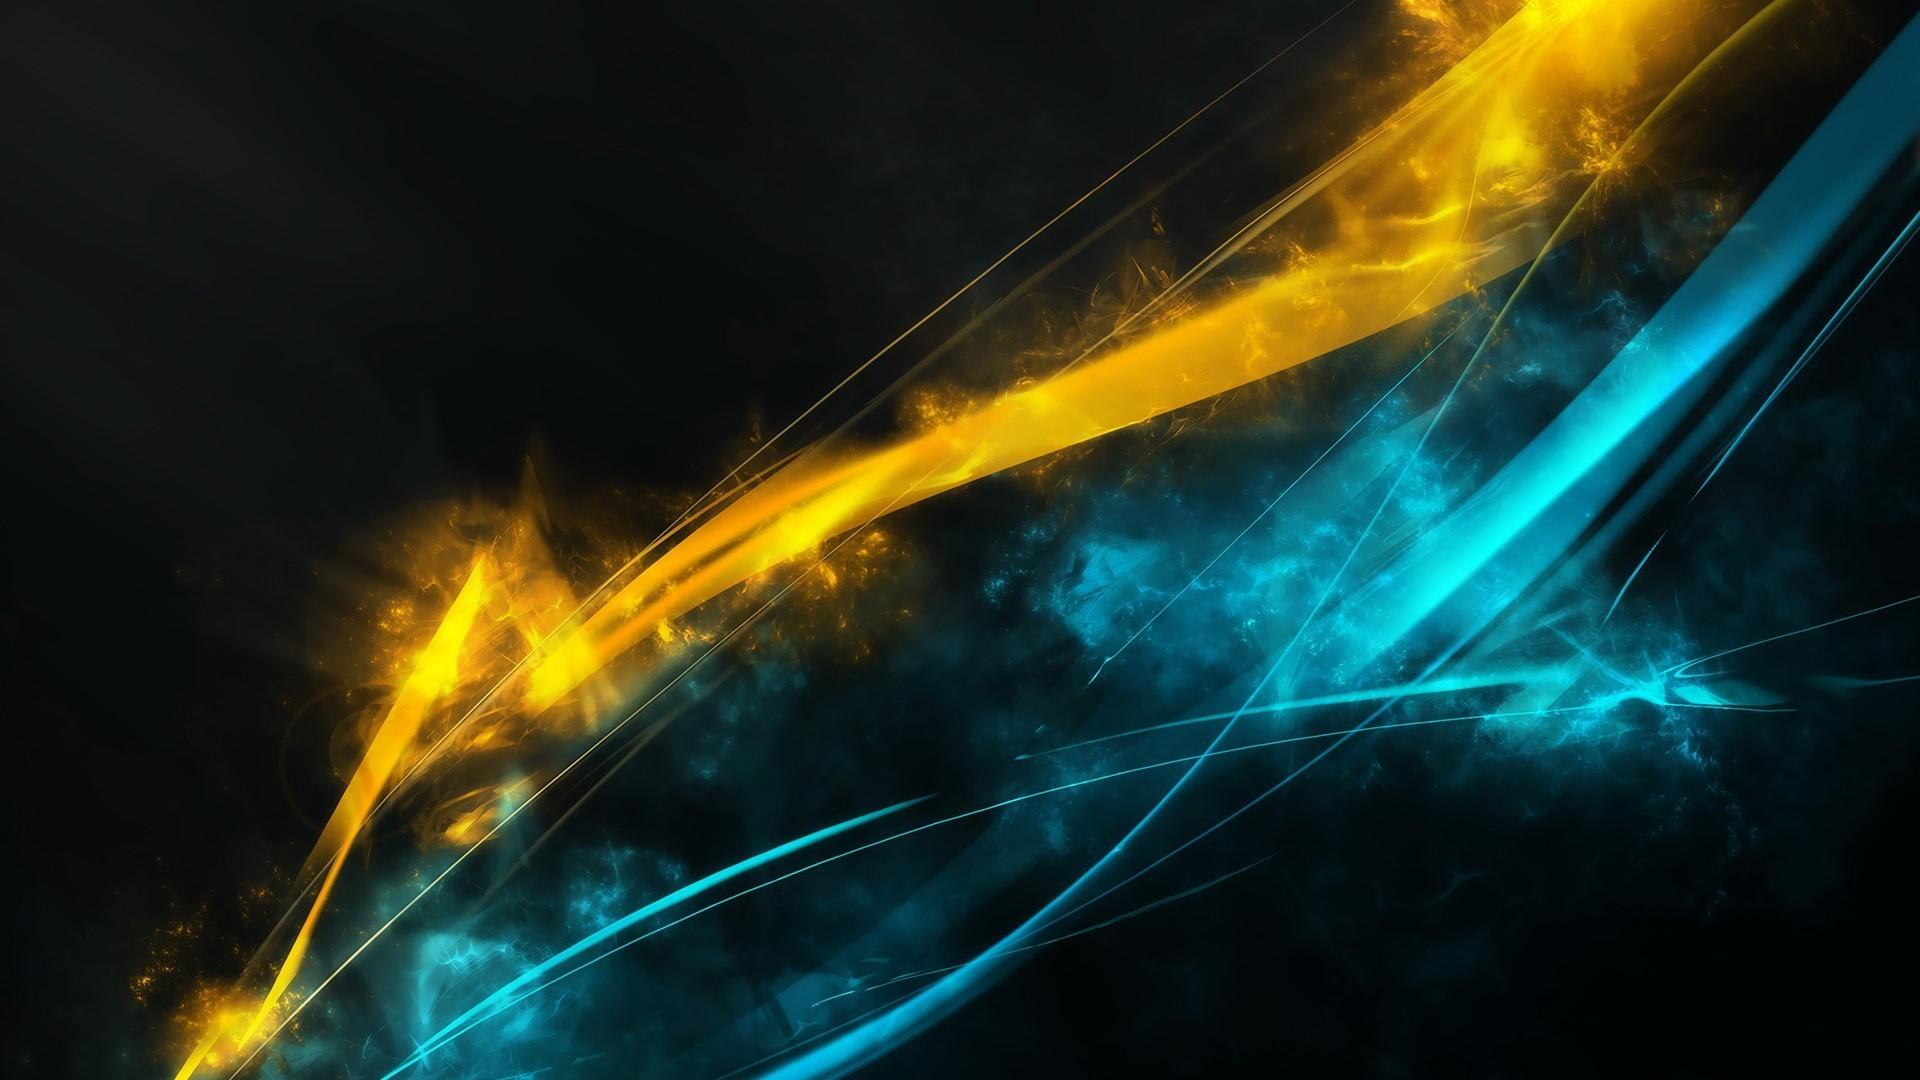 Digital Art, Yellow, Blue, Abstract